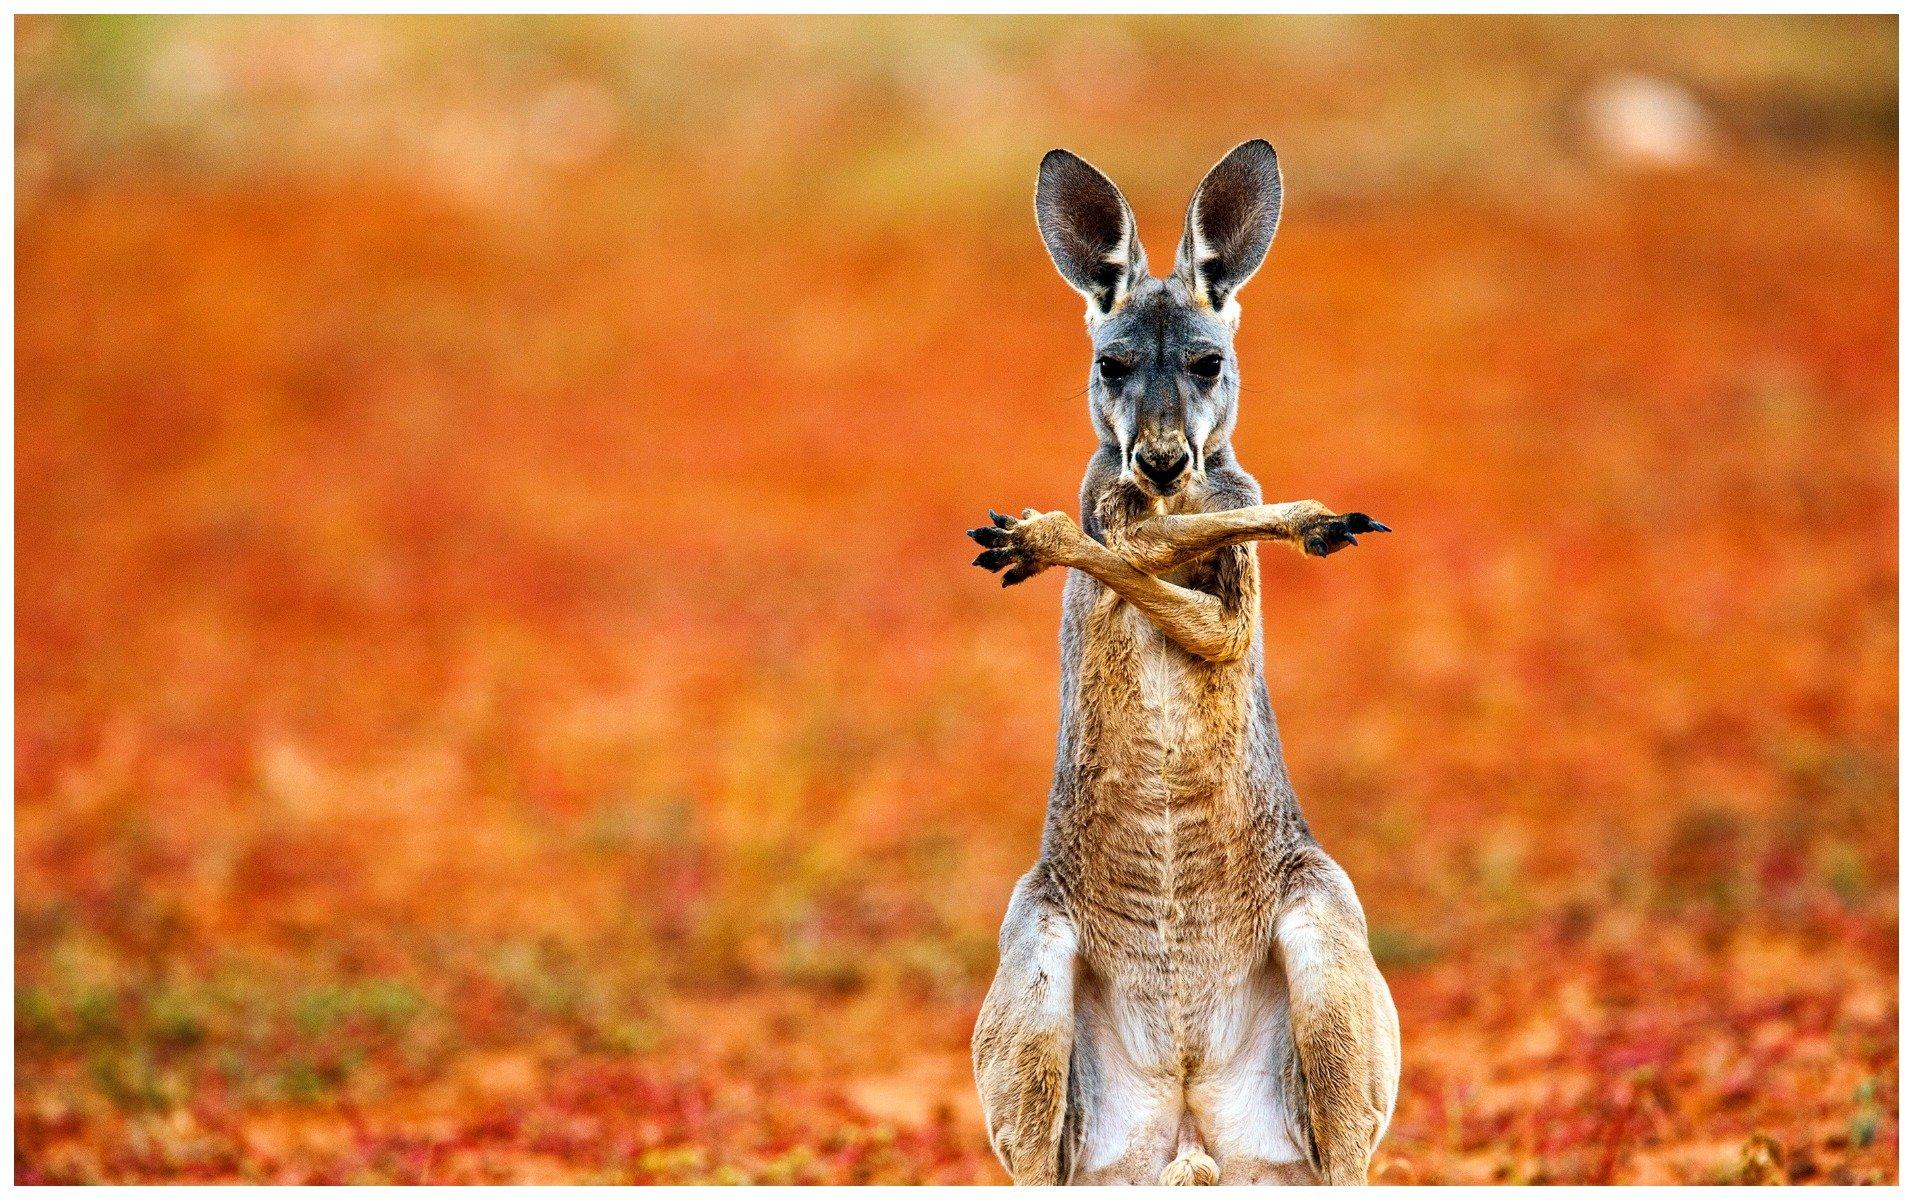 смешные картинки кенгуру славном городе